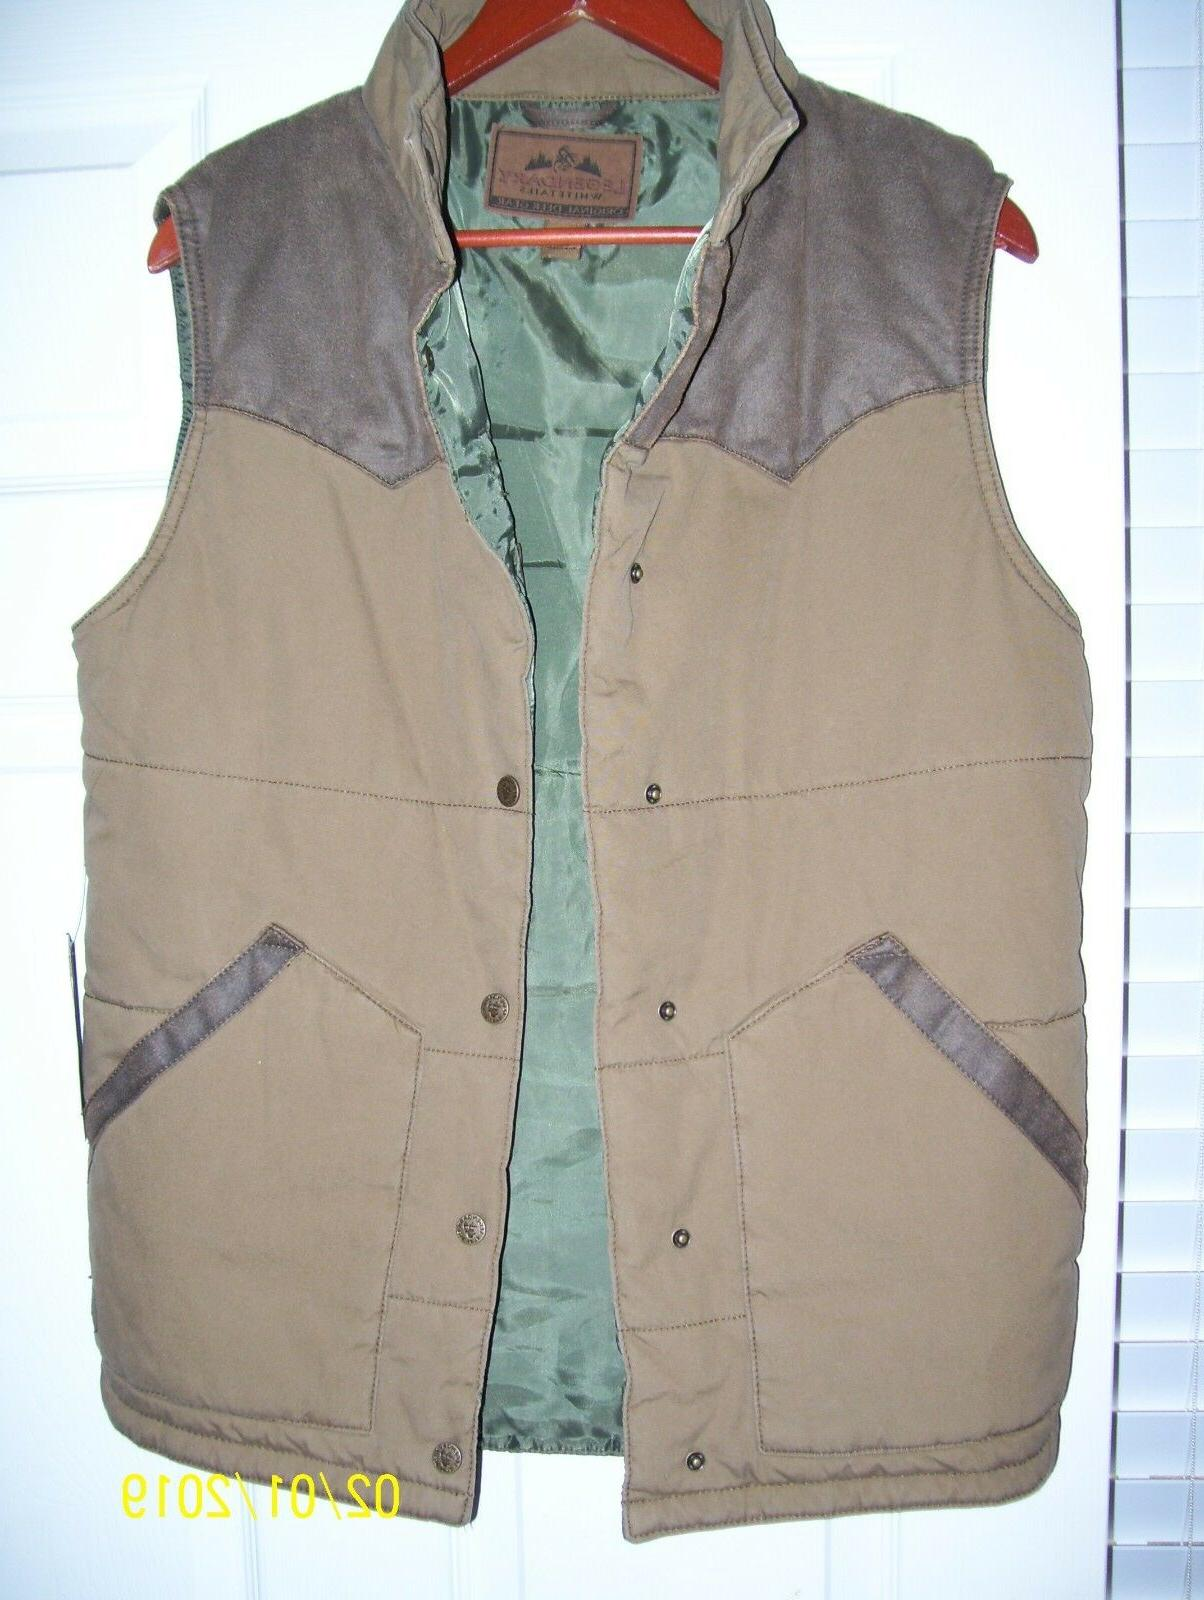 original deer gear vest size small nwt